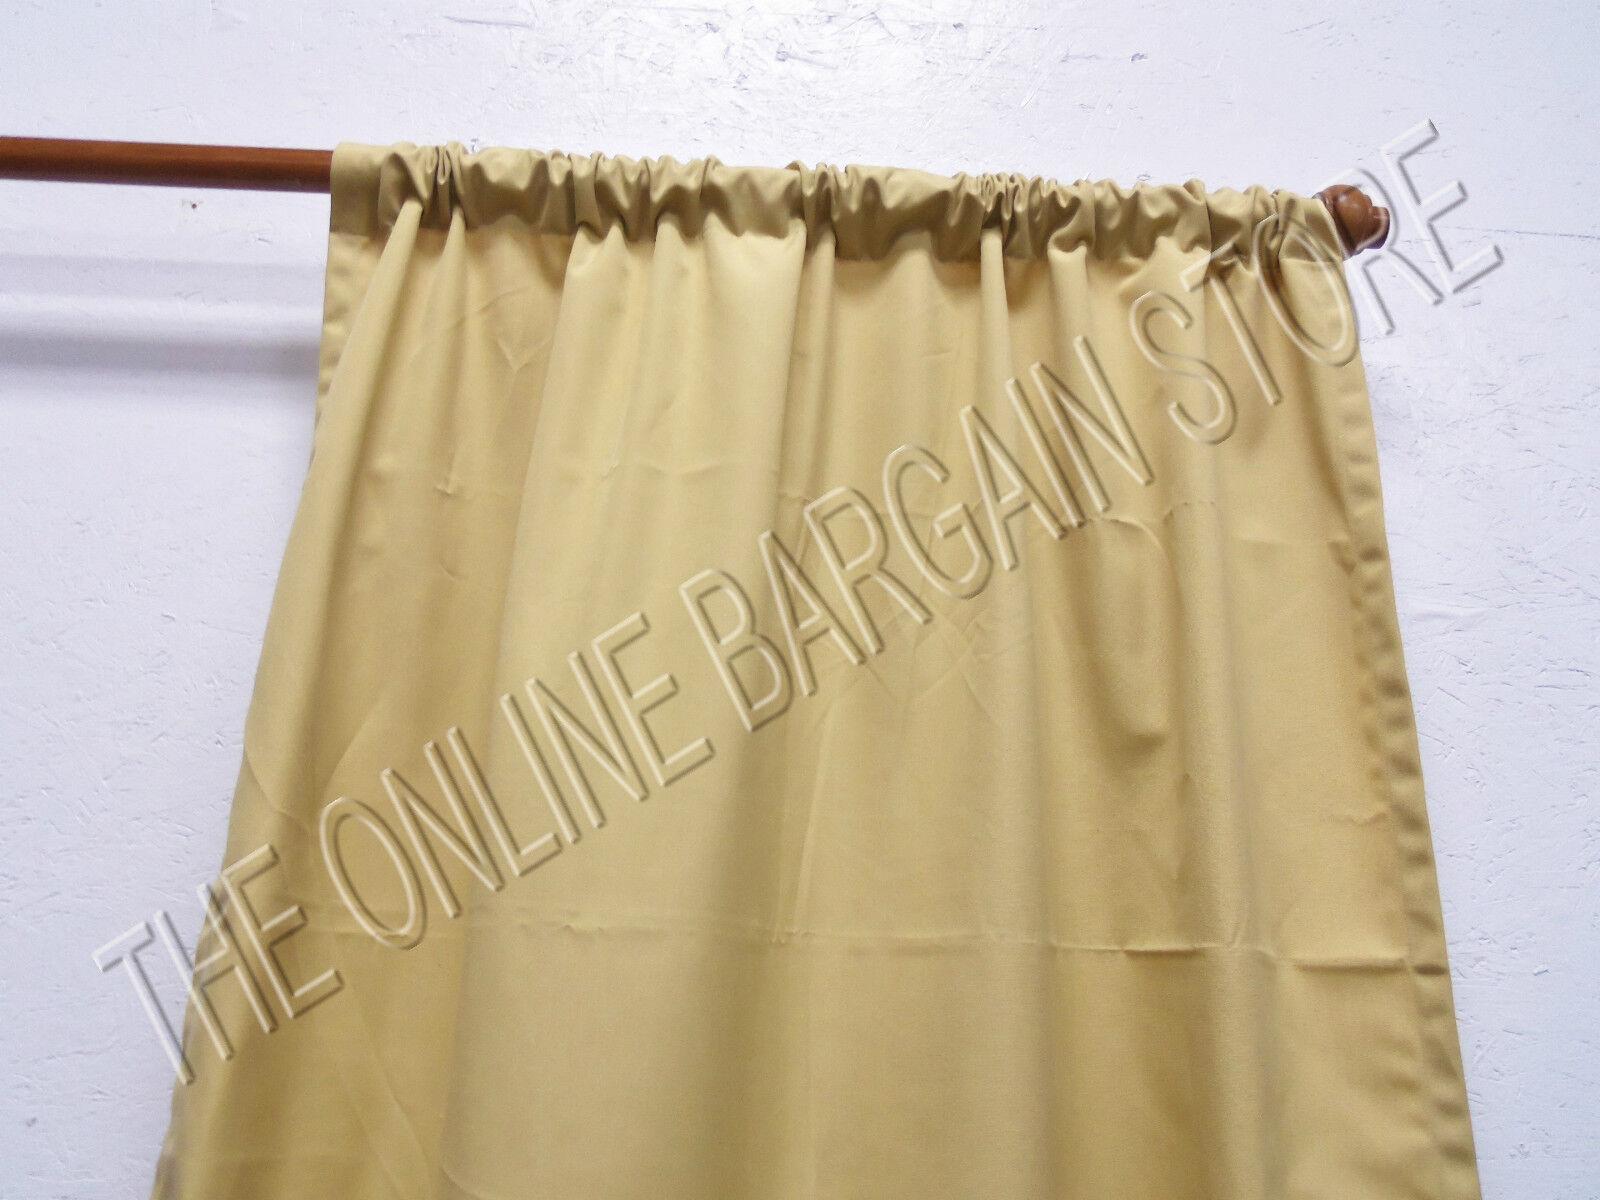 Frontgate al aire libre sólido cortinas, paneles de cortinas Sunbrella trigo 50x96 bolsillo para barra